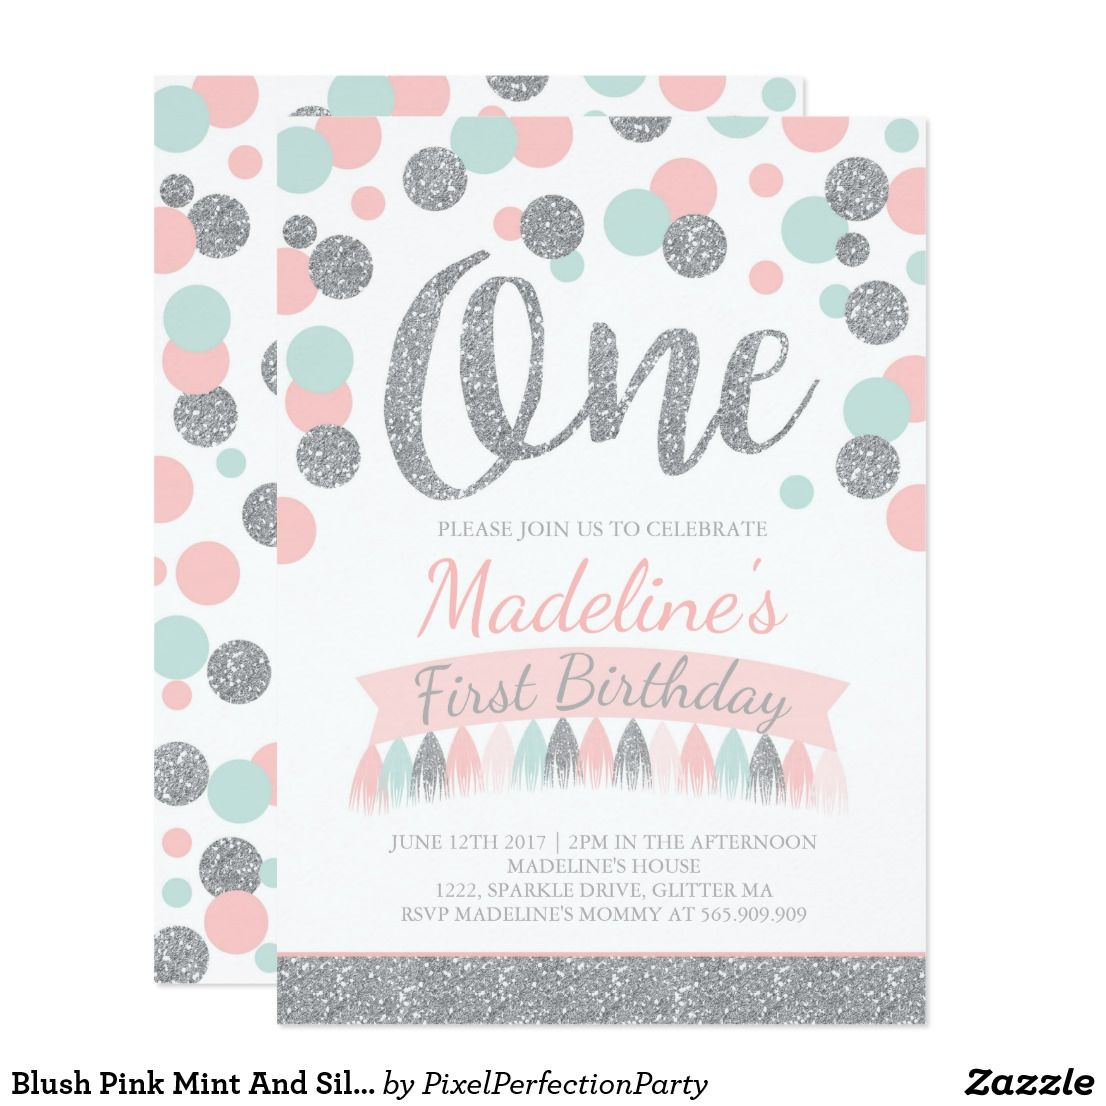 Blush Pink Mint And Silver 1st Birthday Invitation